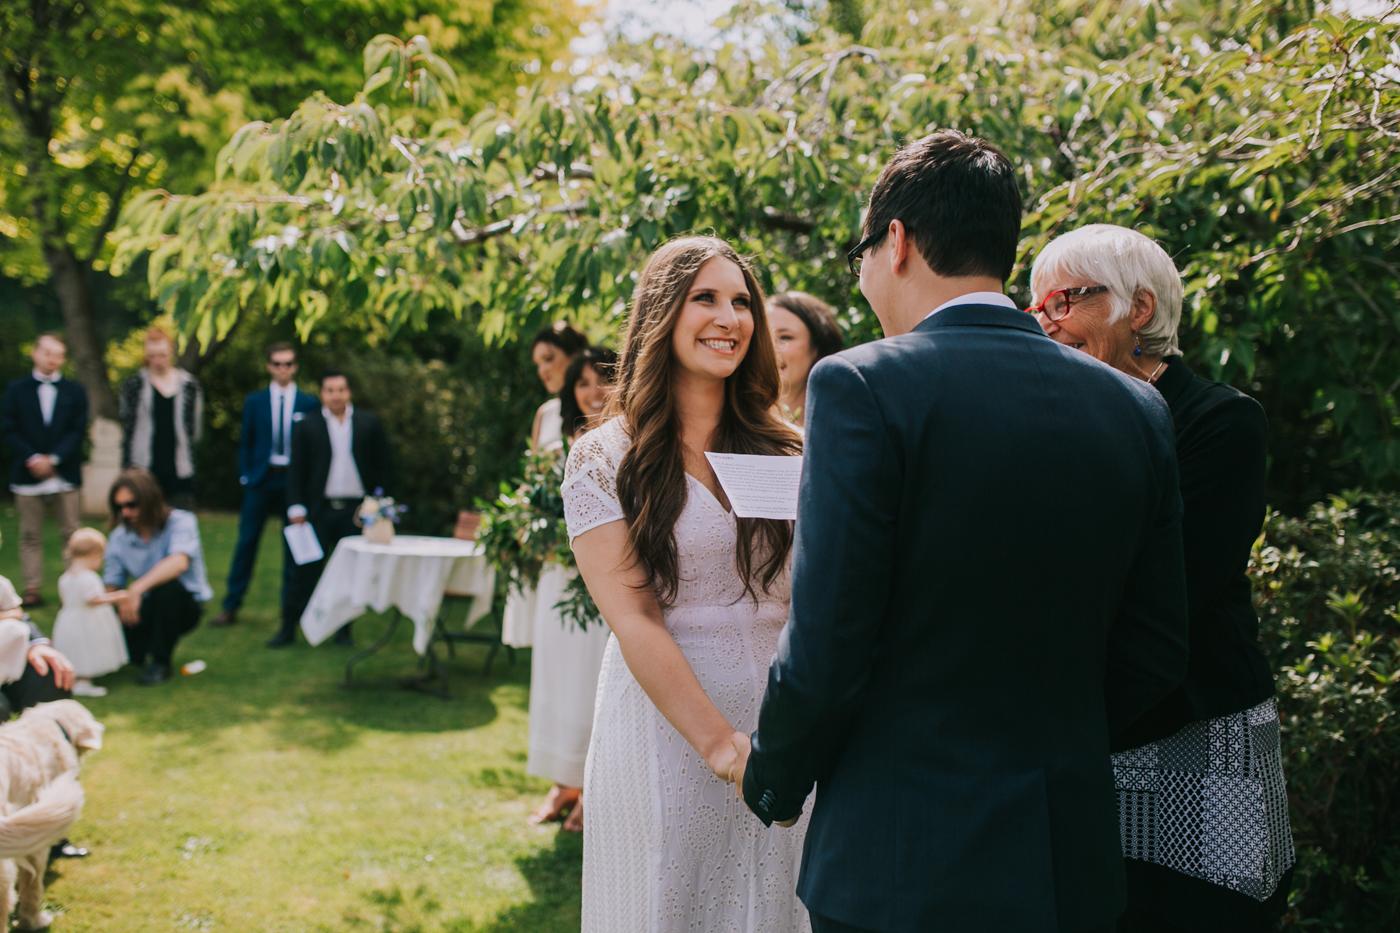 Ariana & Tim - Dunedin, New Zealand Wedding - Destination Wedding - Samantha Heather Photography-98.jpg